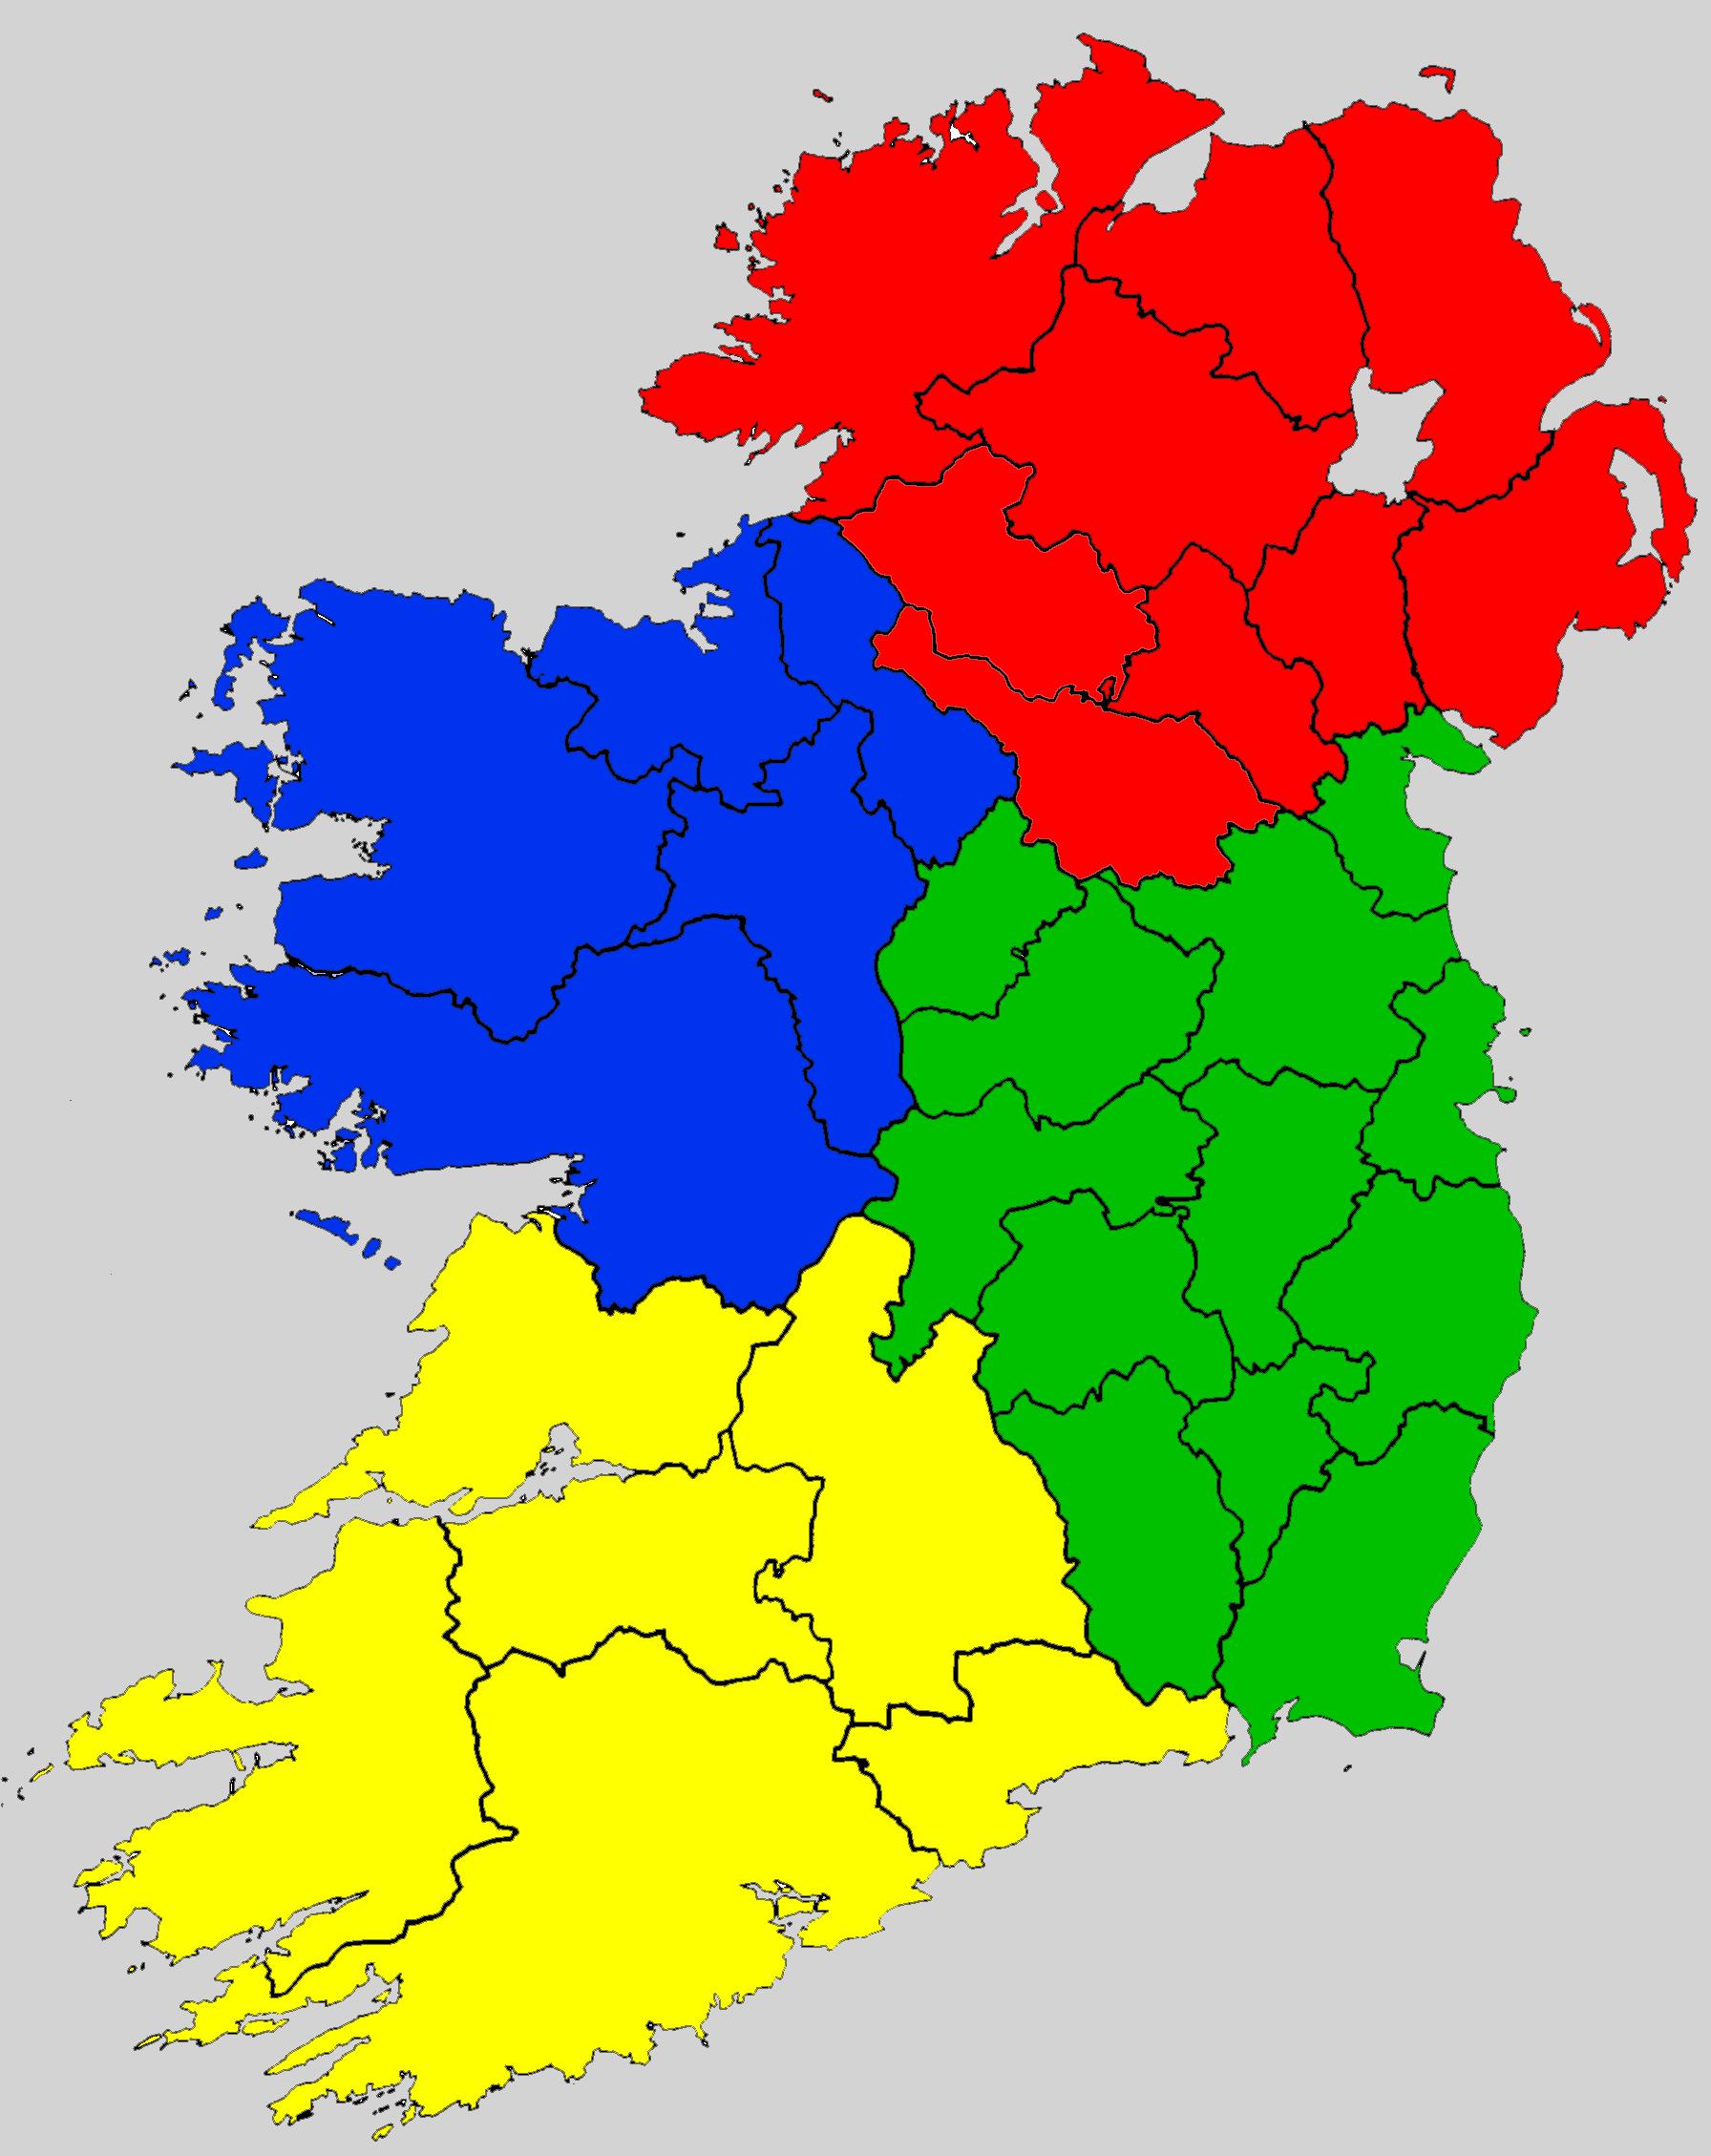 File:Ireland location provinces.jpg - Wikimedia Commons